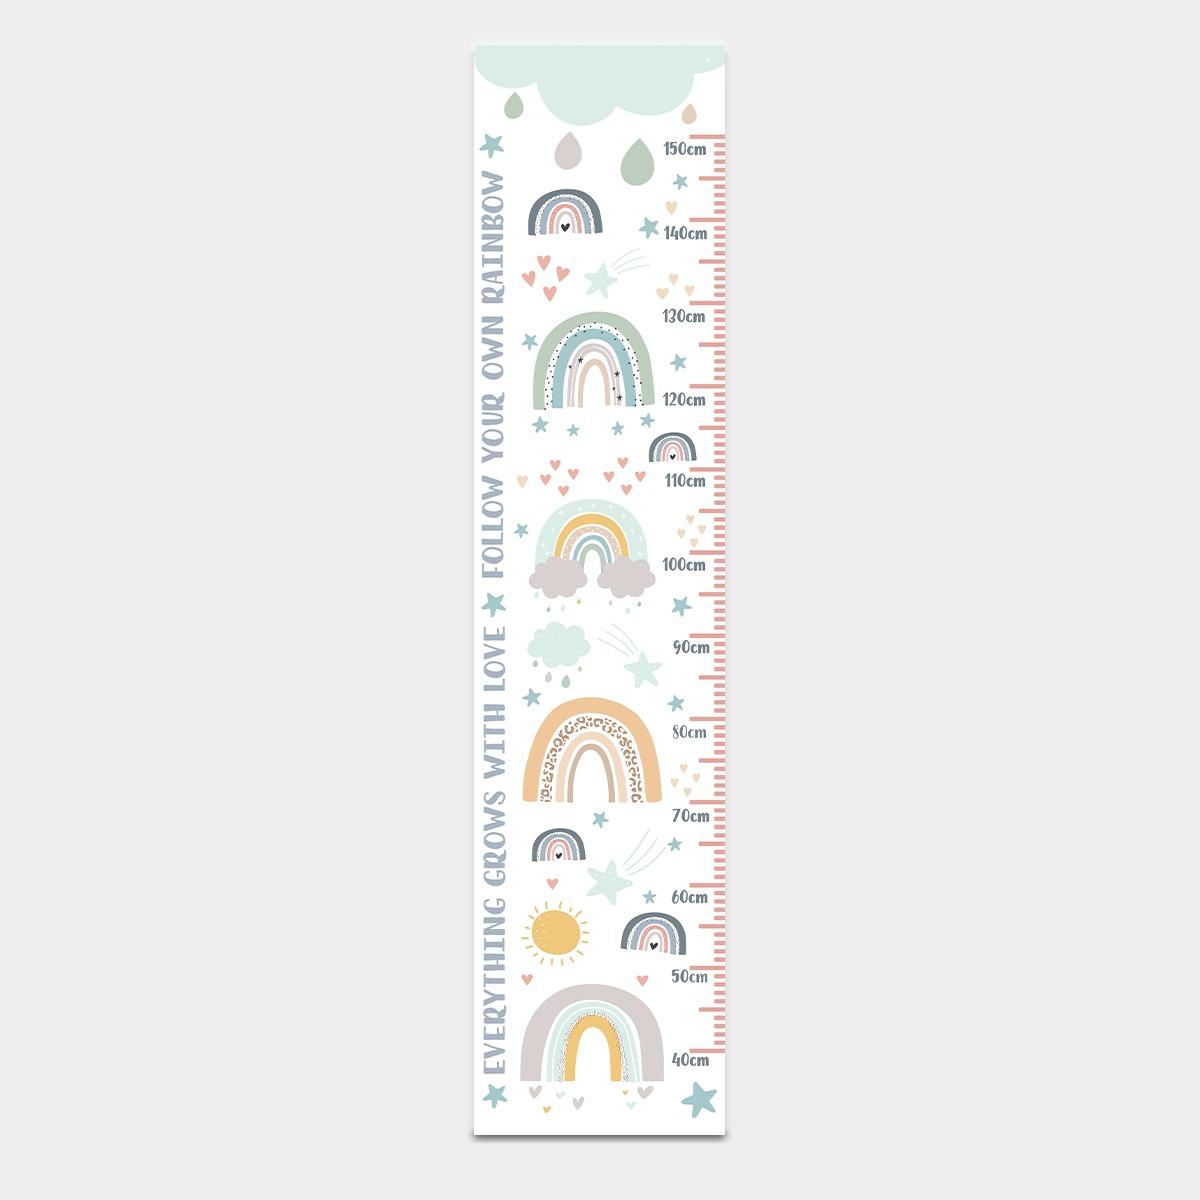 Rainbow Height Chart – Poster